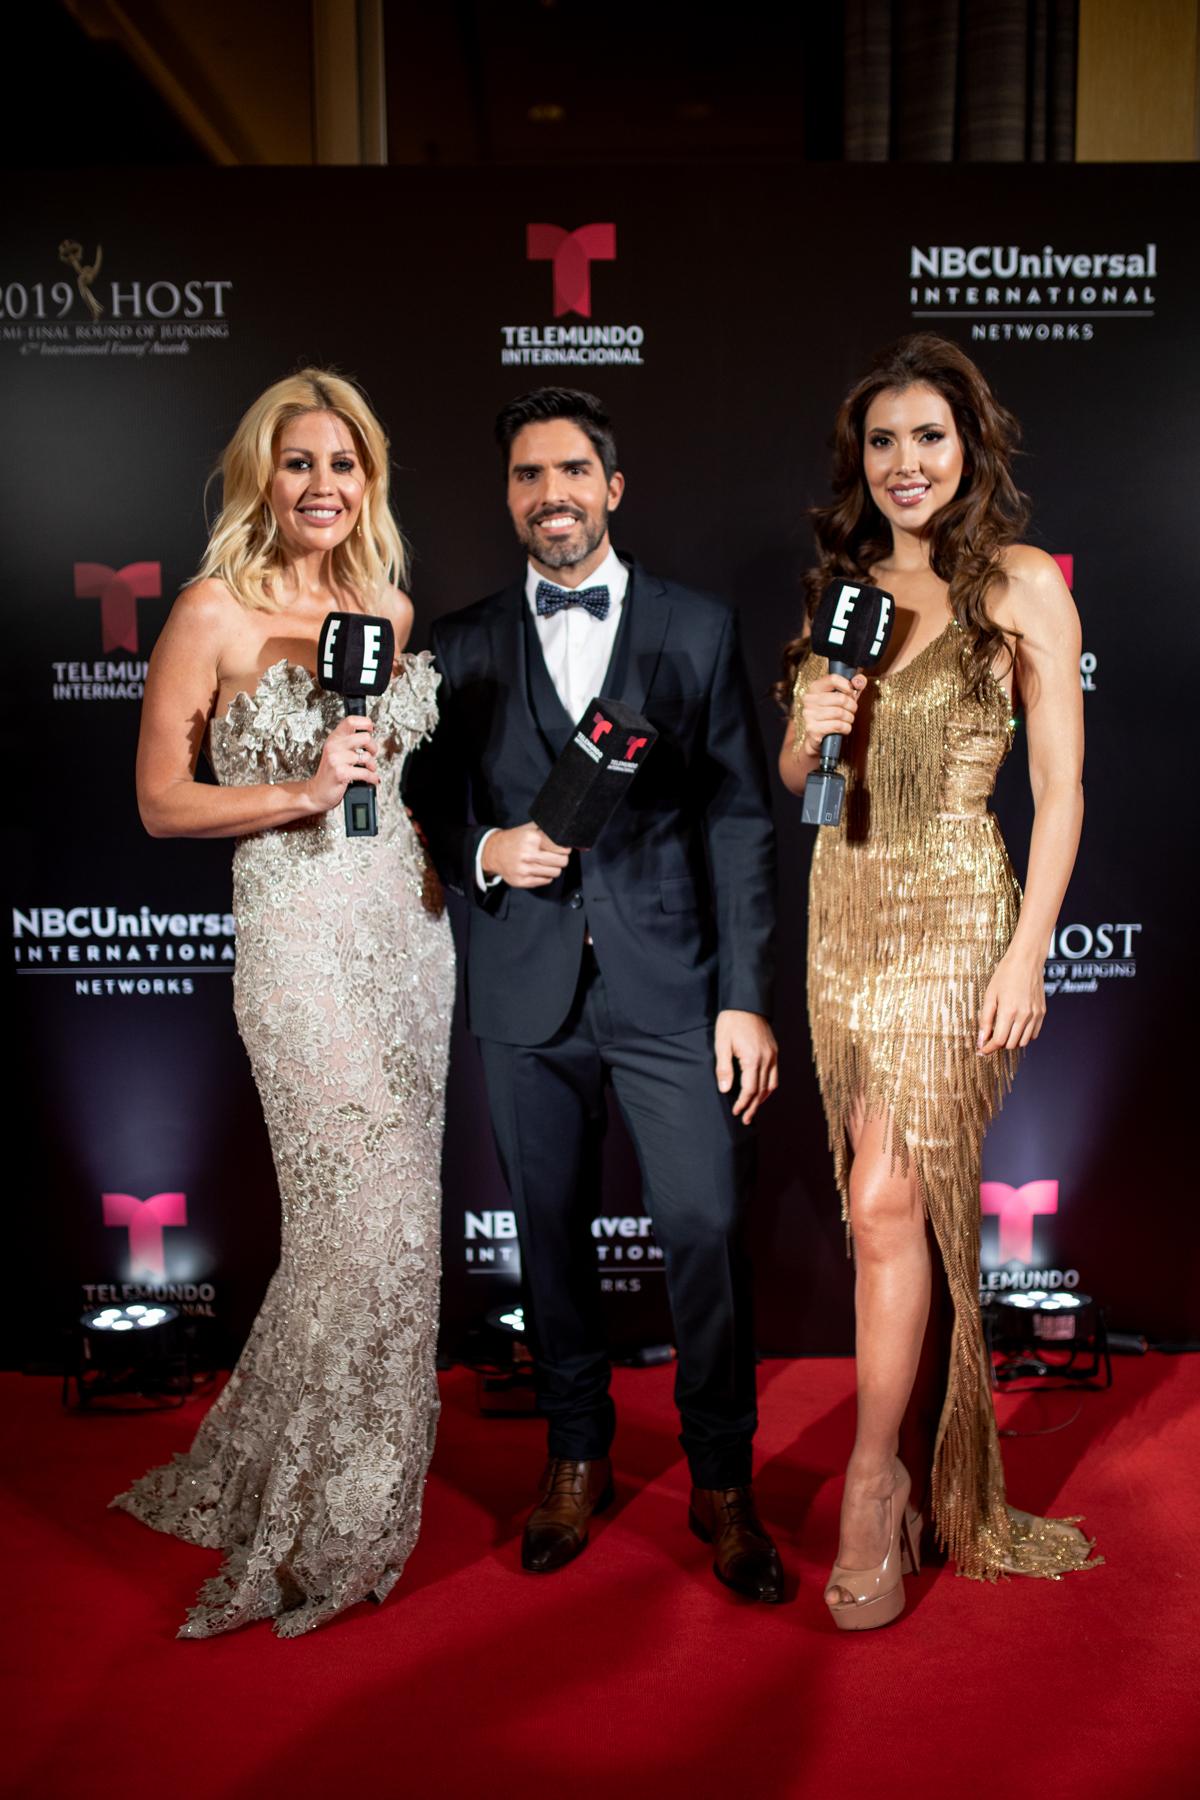 Barbie Simons, Javier Ponzone y Nataly Chilet_2